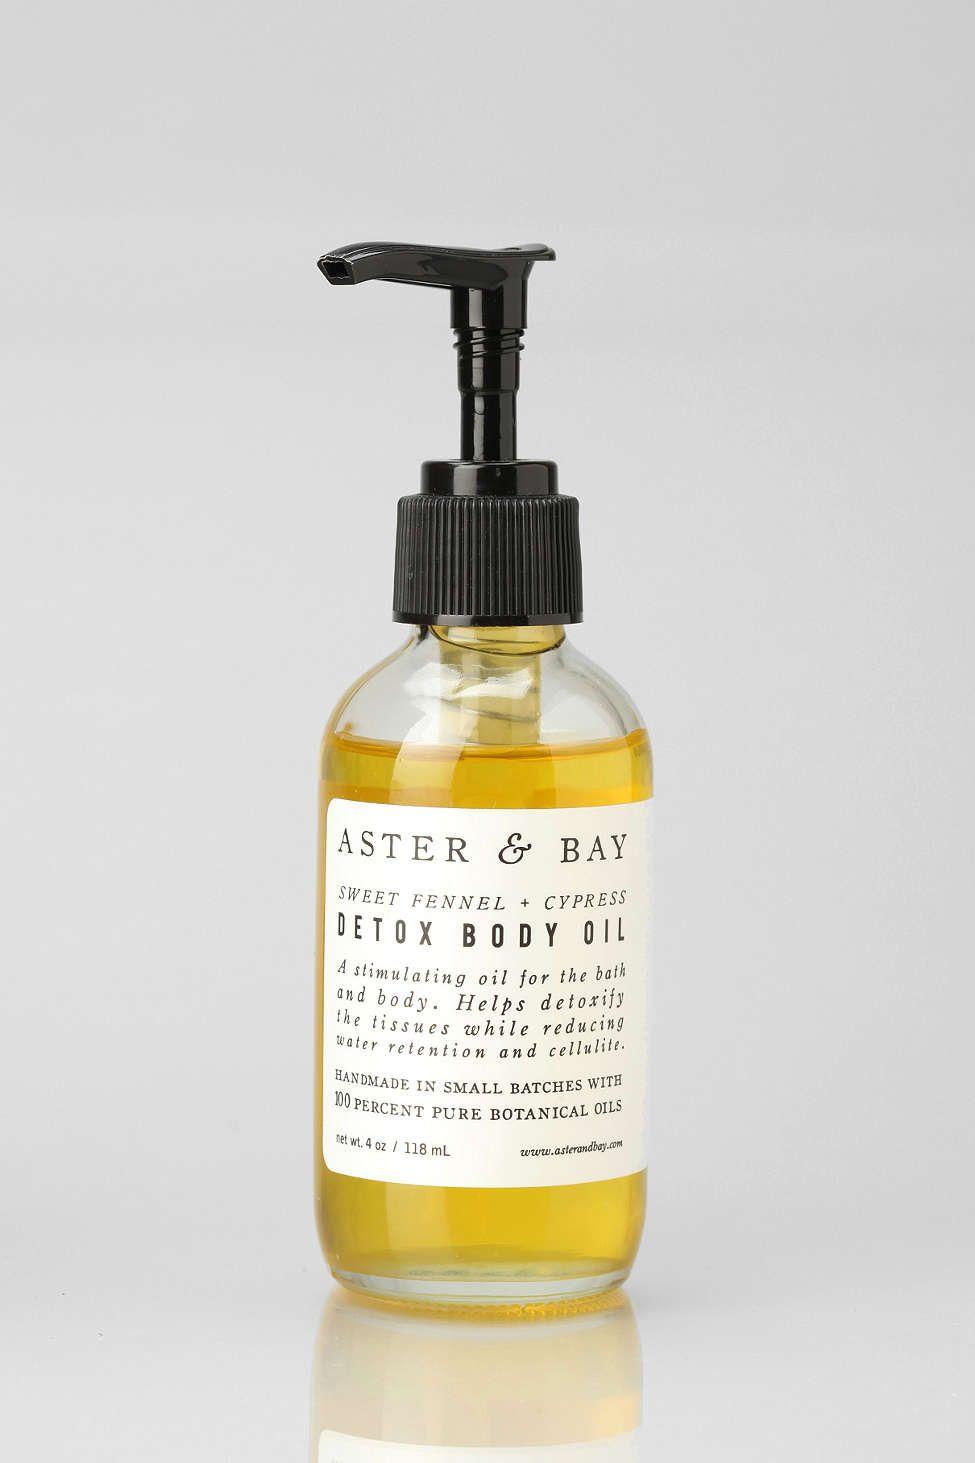 Aster bay detox body oil body oil body detox body